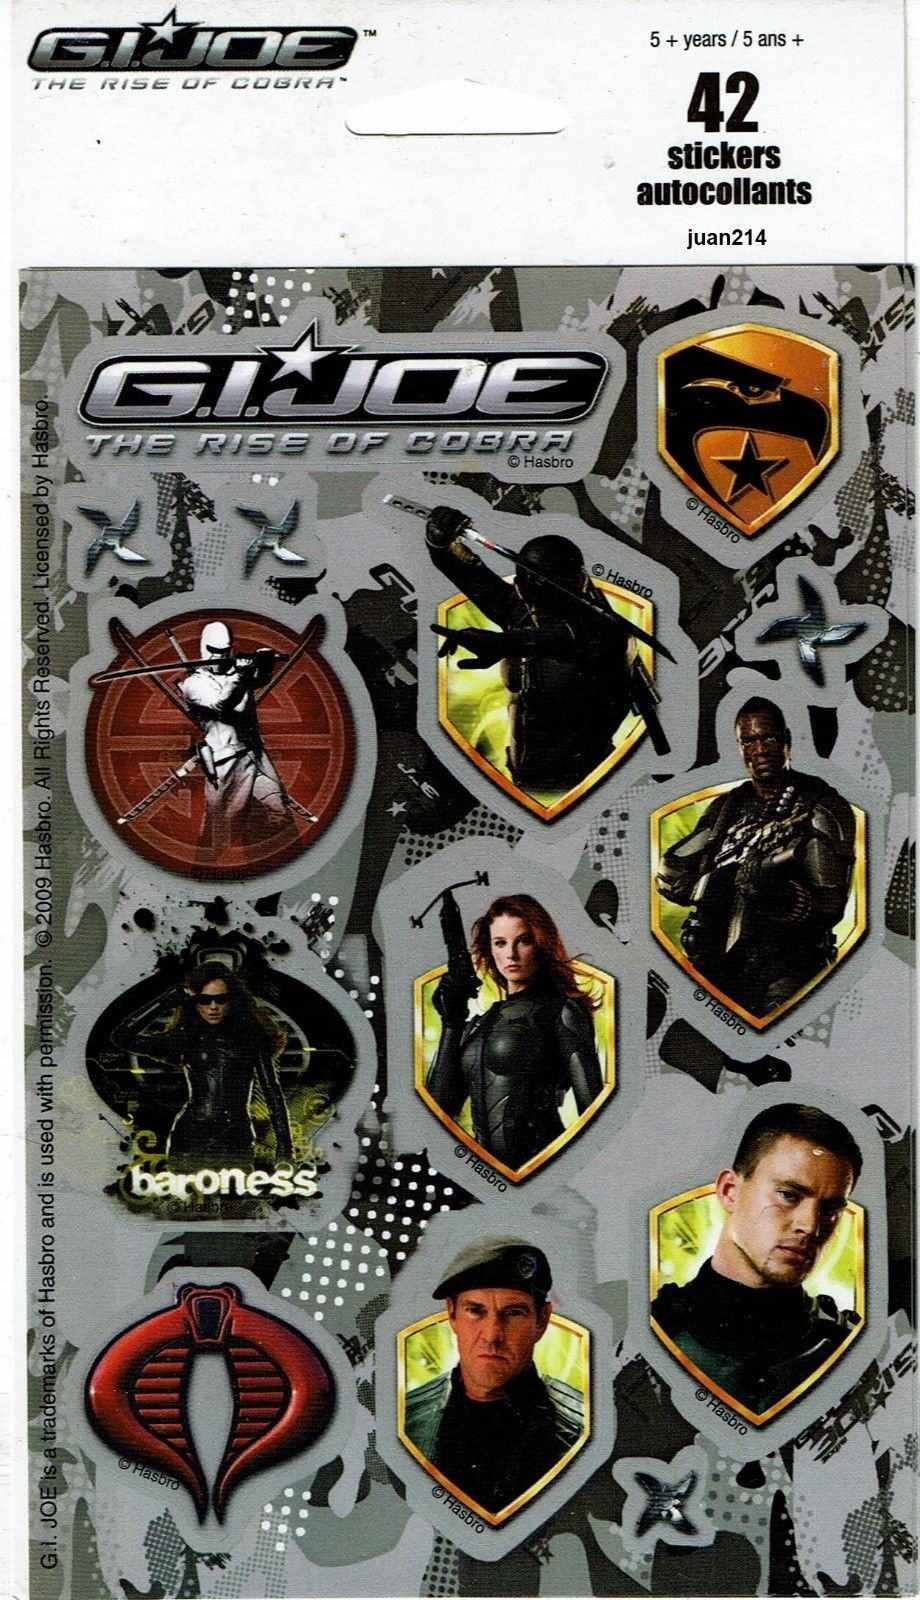 G I Joe The Rise Of Cobra 42 Stickers Retaliation Duke Snake Eyes Baroness 67008457762 Ebay Snake Eyes Stickers Dora The Explorer [ 1600 x 920 Pixel ]